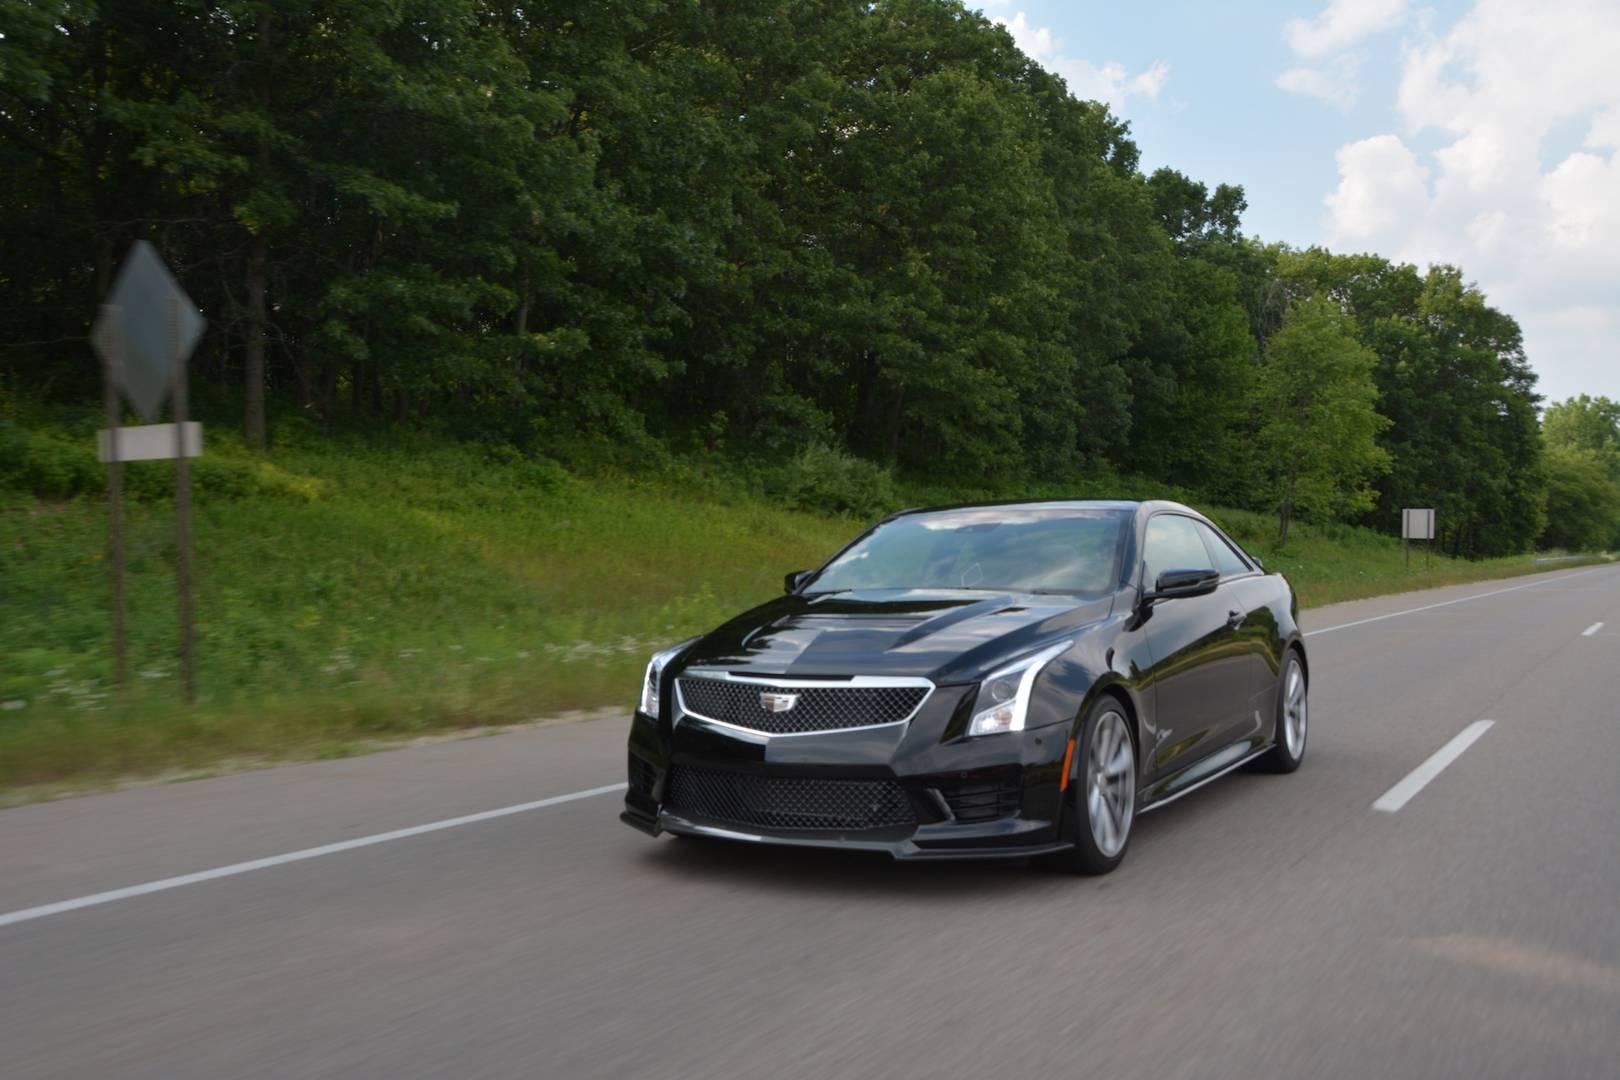 2019 Cadillac ATS-V Coupe Review - GTspirit